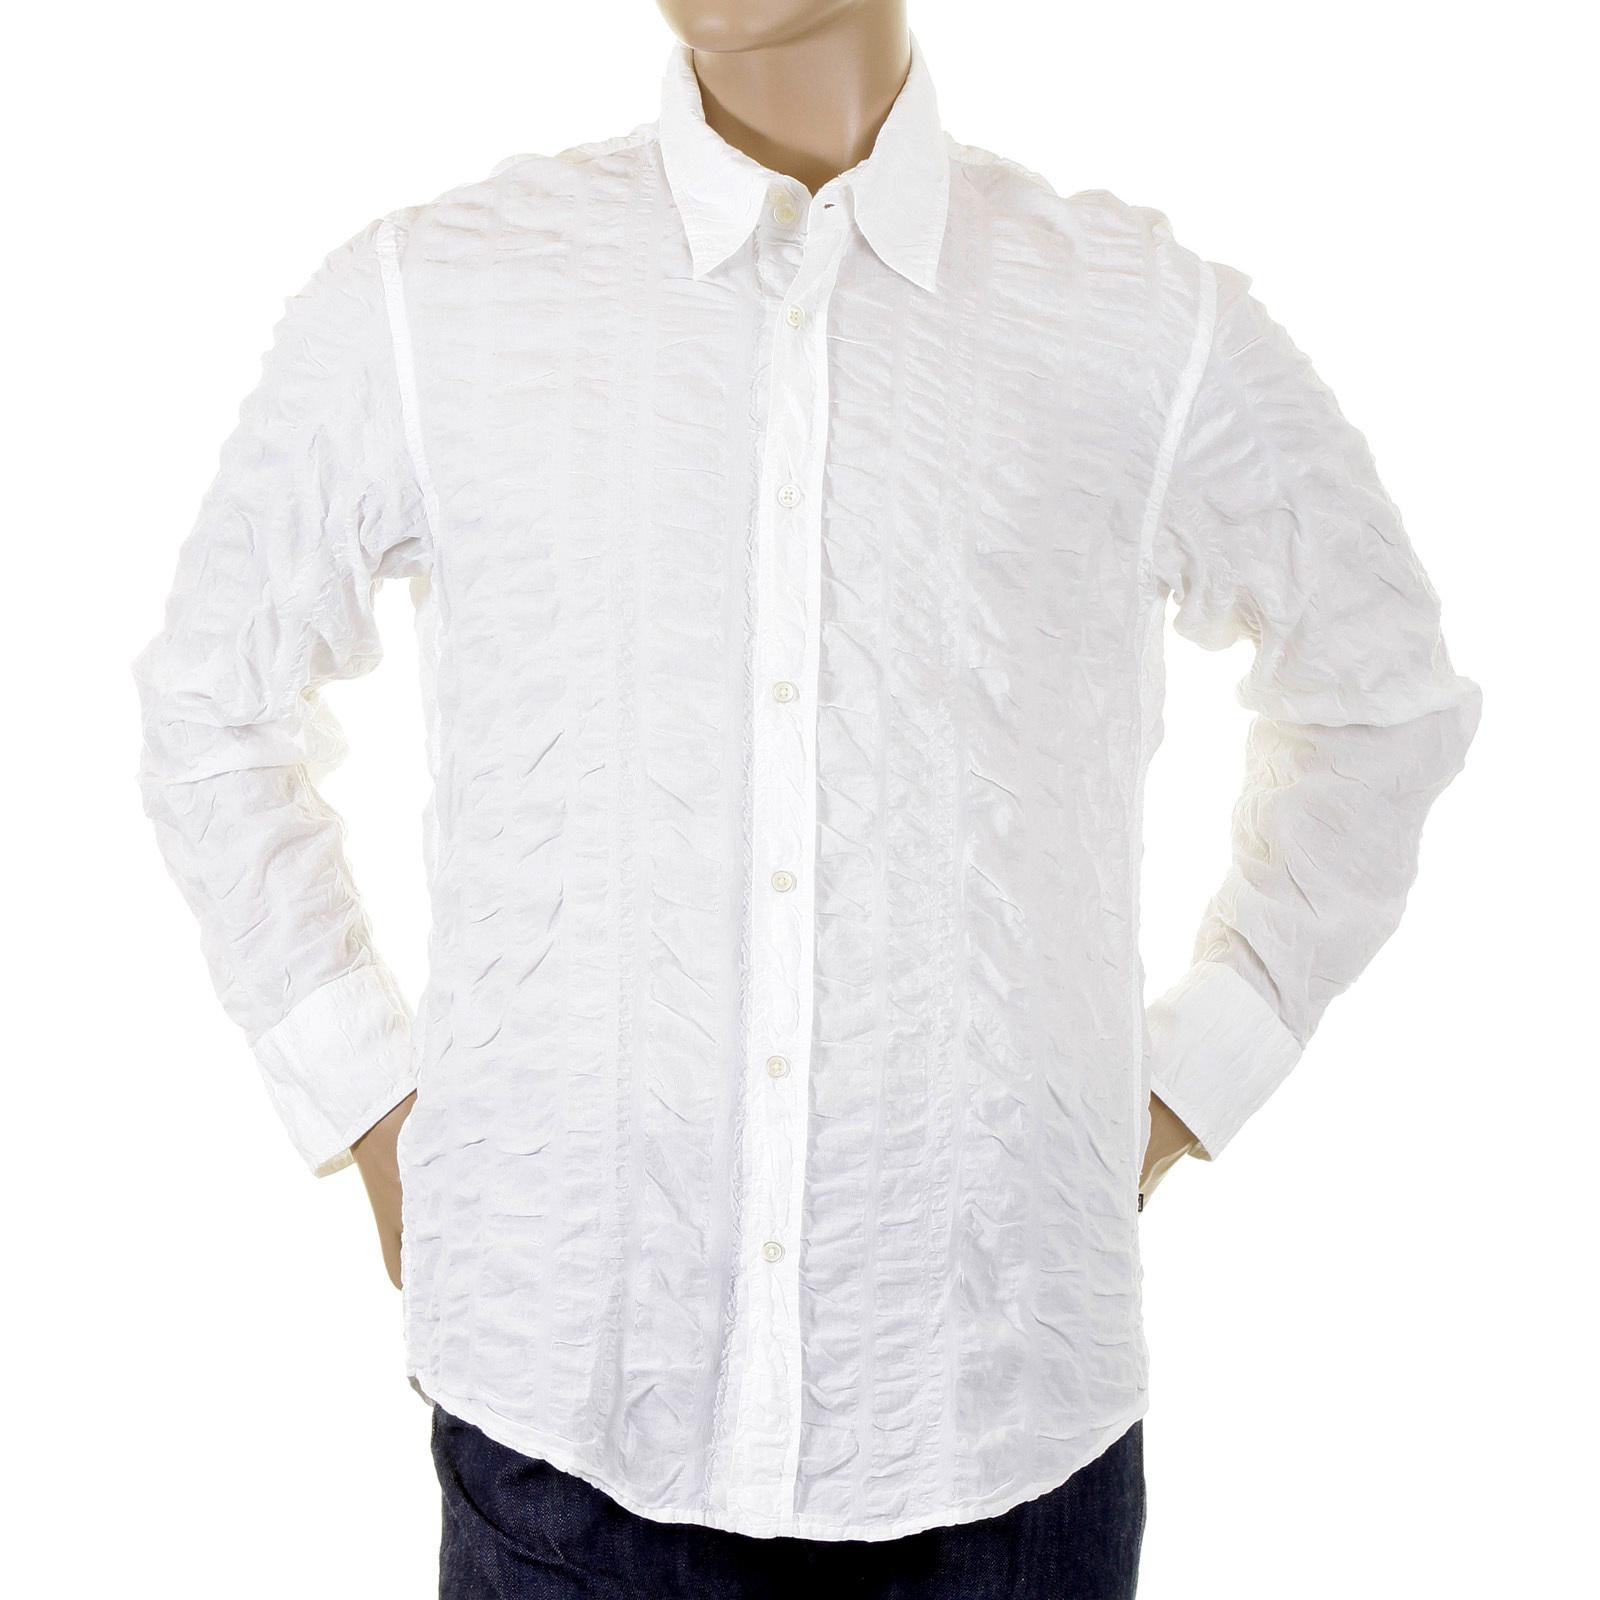 hugo boss lucas white casual shirt 05793 boss1387 at